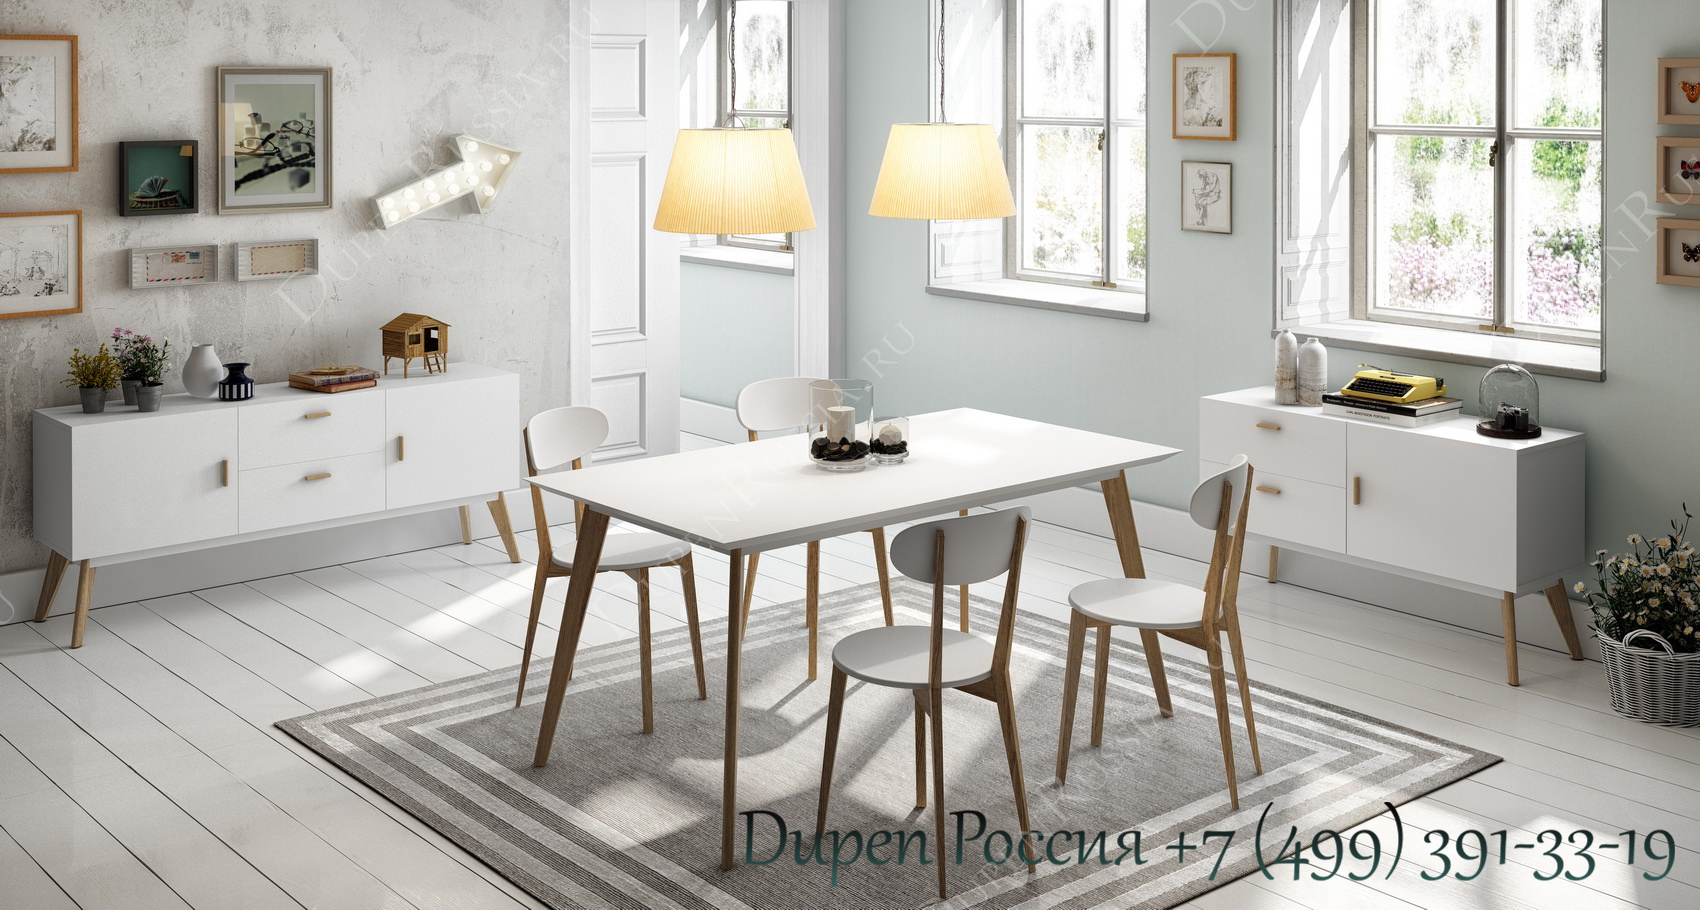 Стол DUPEN DT-900, Стул DUPEN CH-900, Комод DUPEN W-900, Комод DUPEN W-901